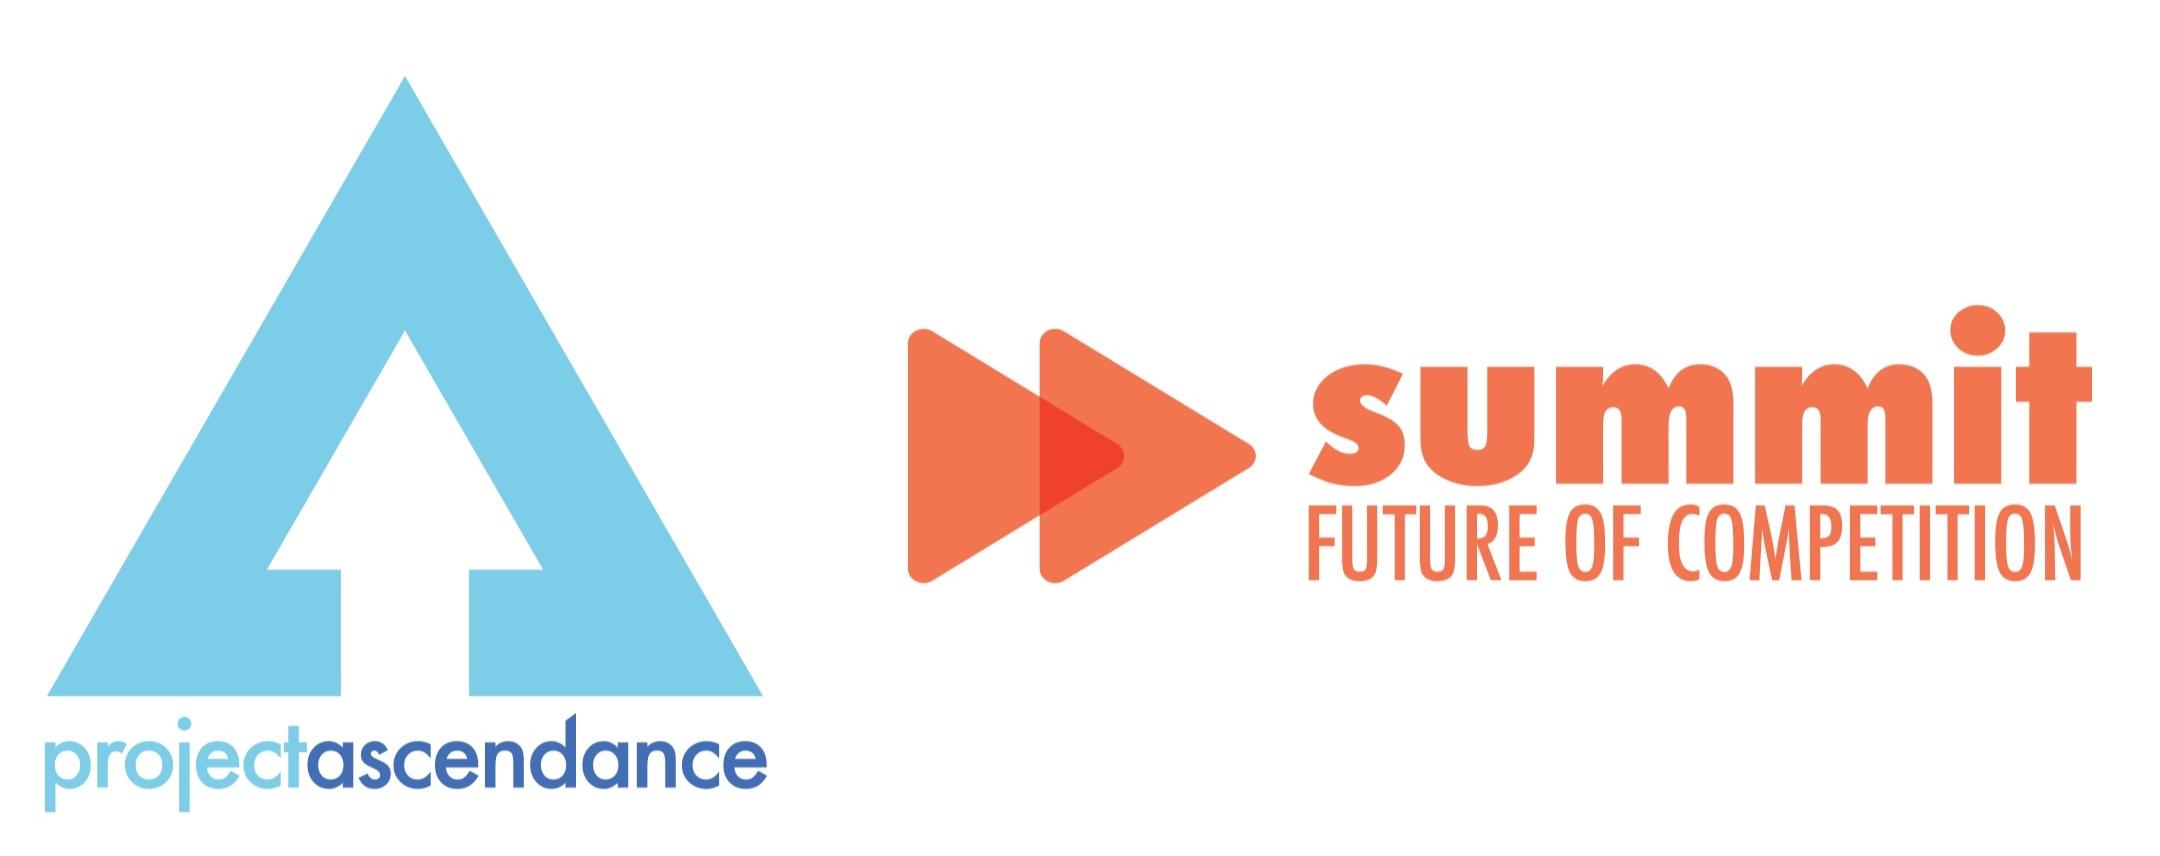 PA-and-Summit-Logo-2160x1080.jpg